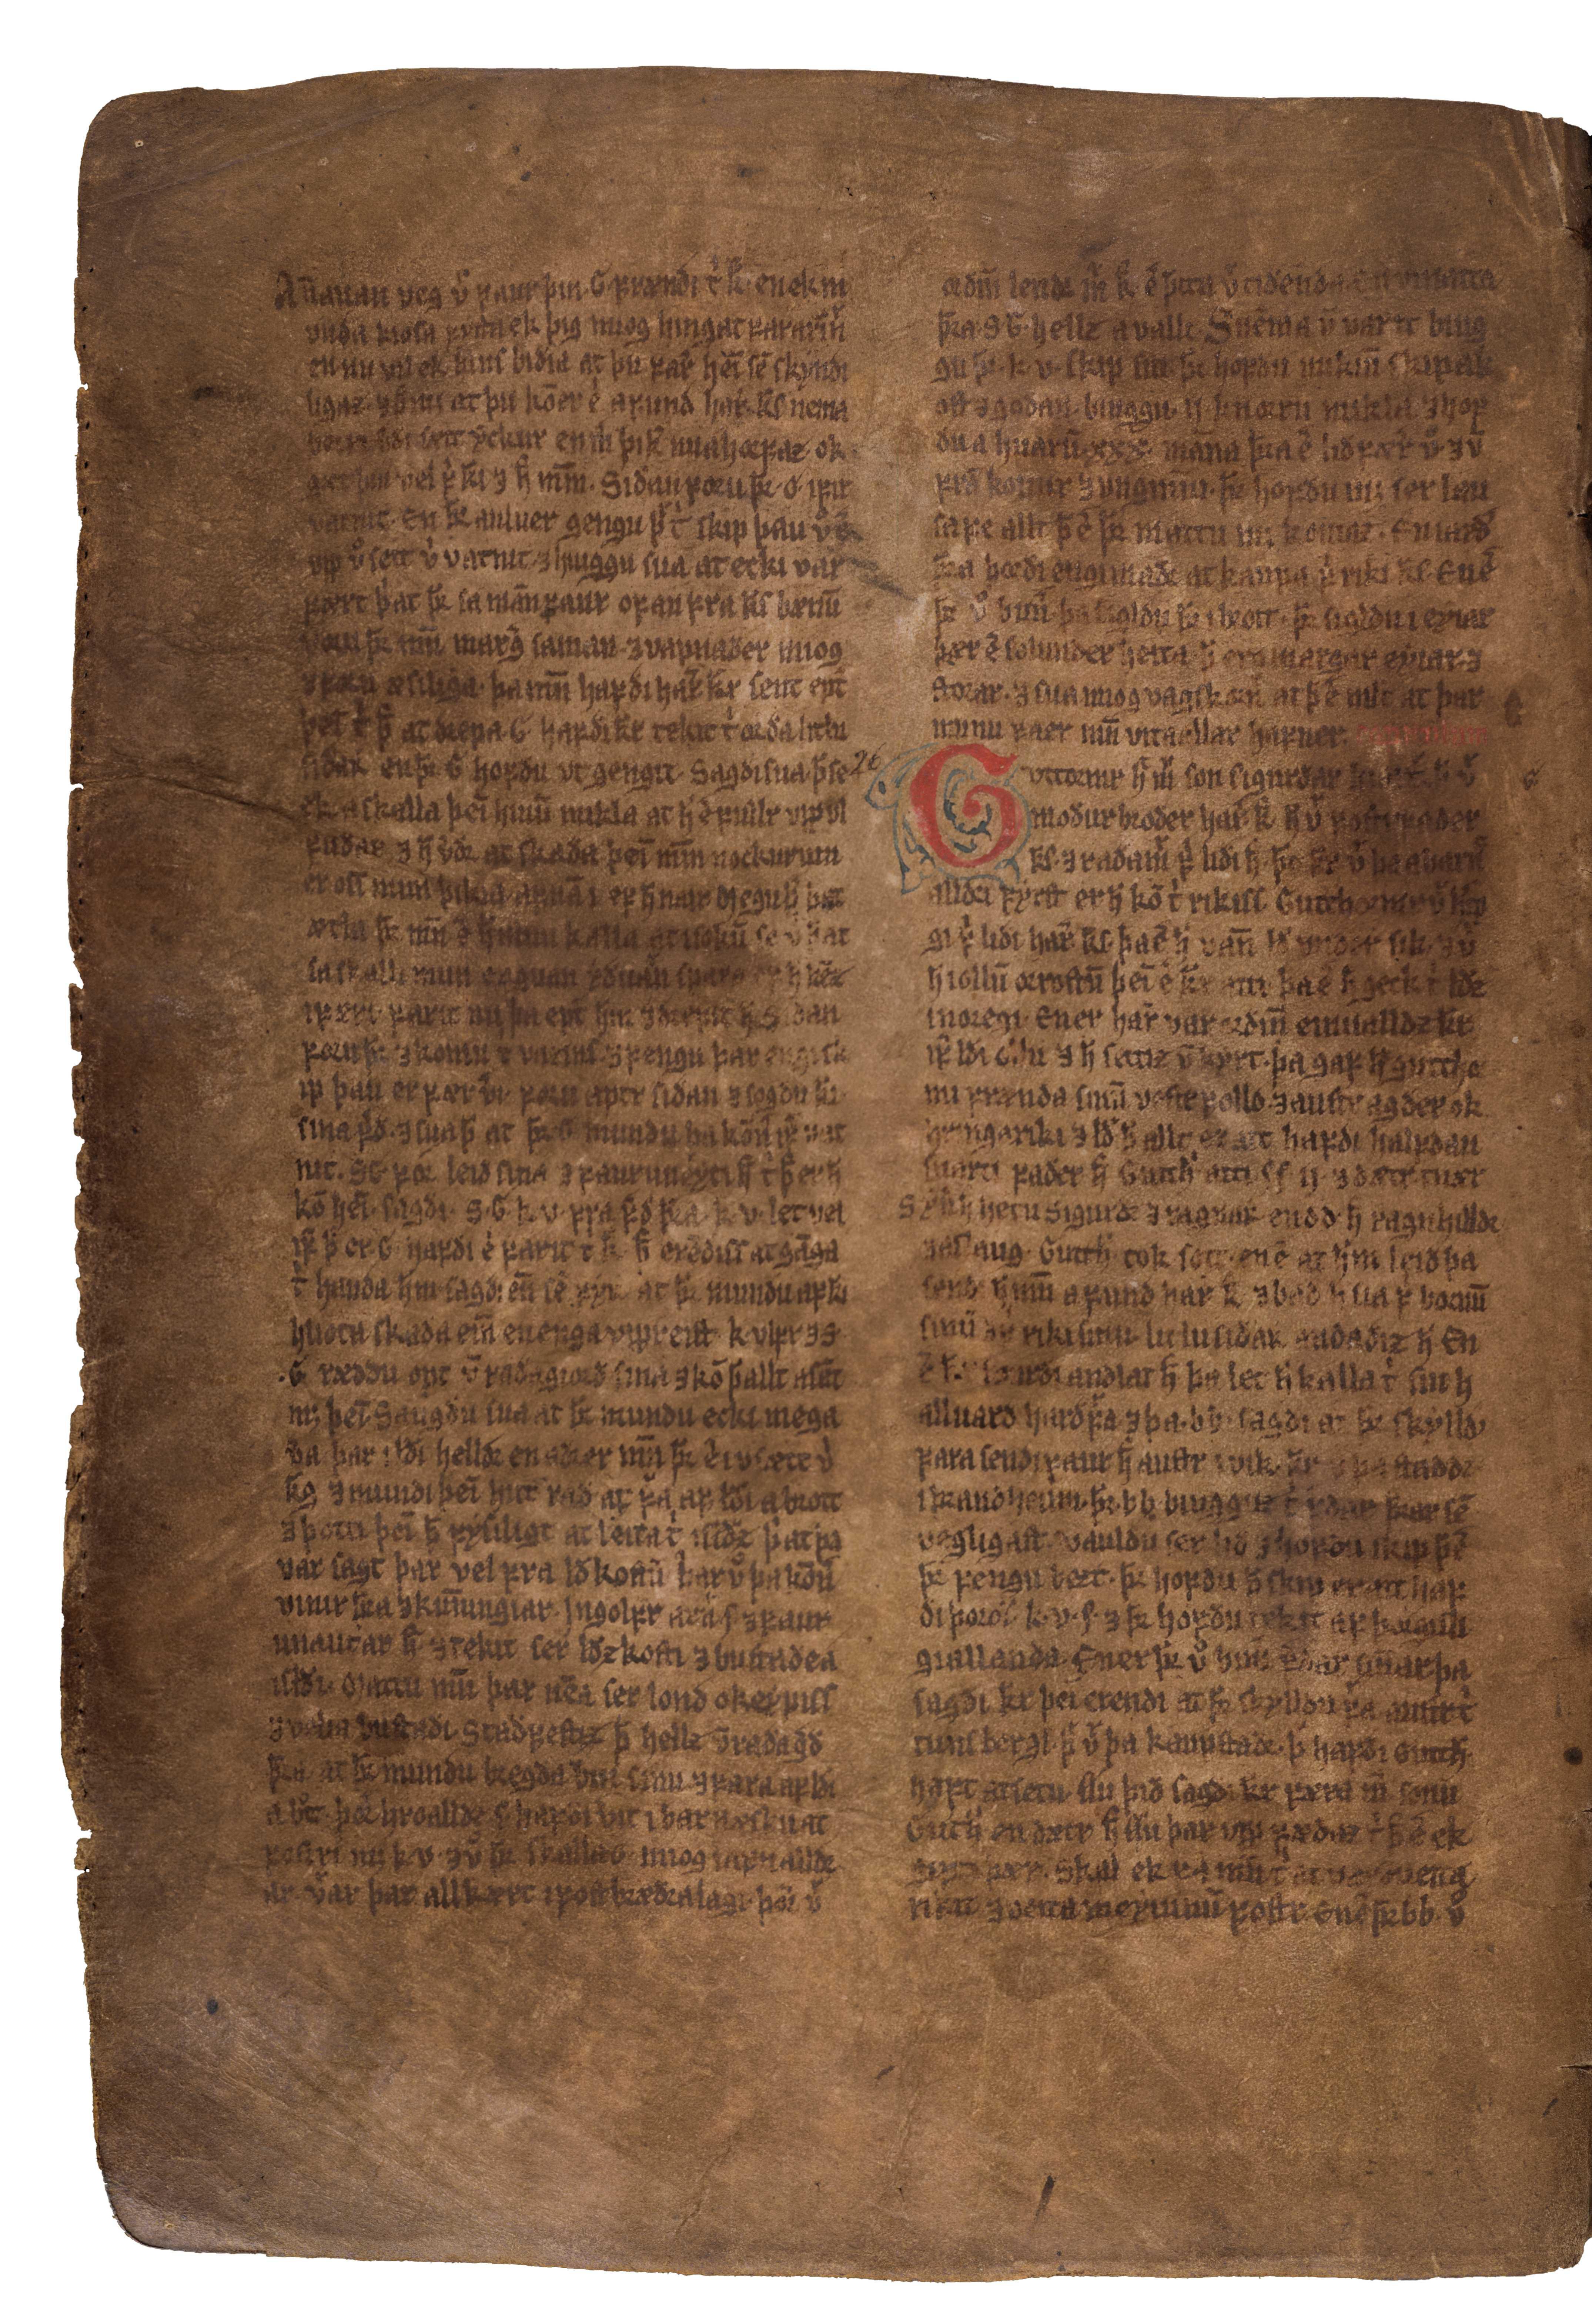 AM 132 fol - 71v